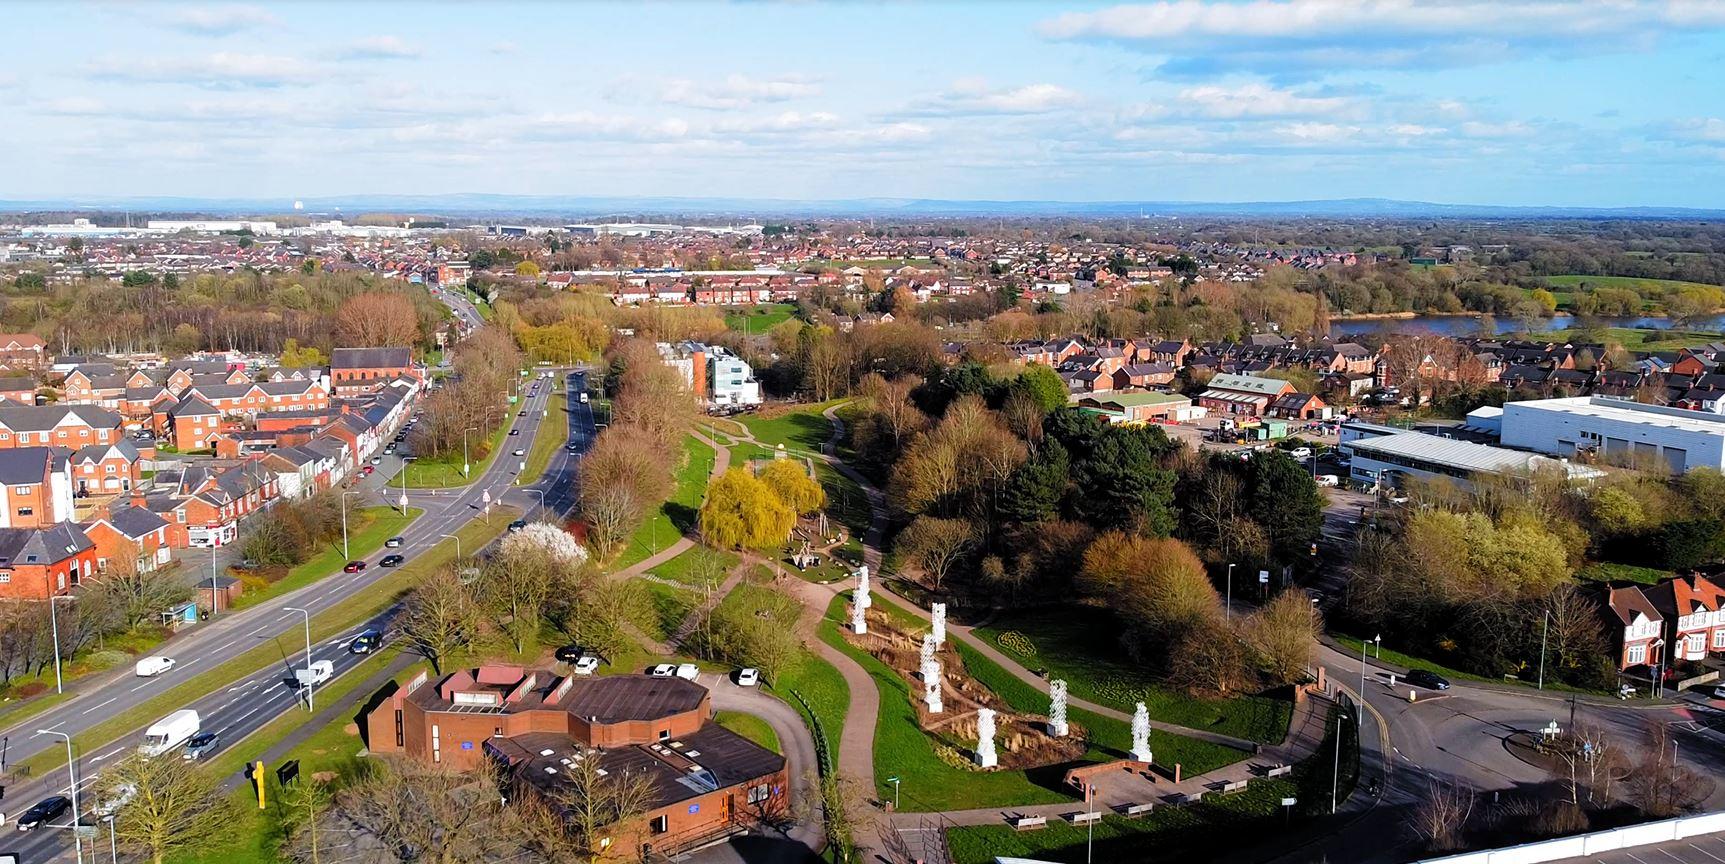 An aerial view of Winsford town centre.